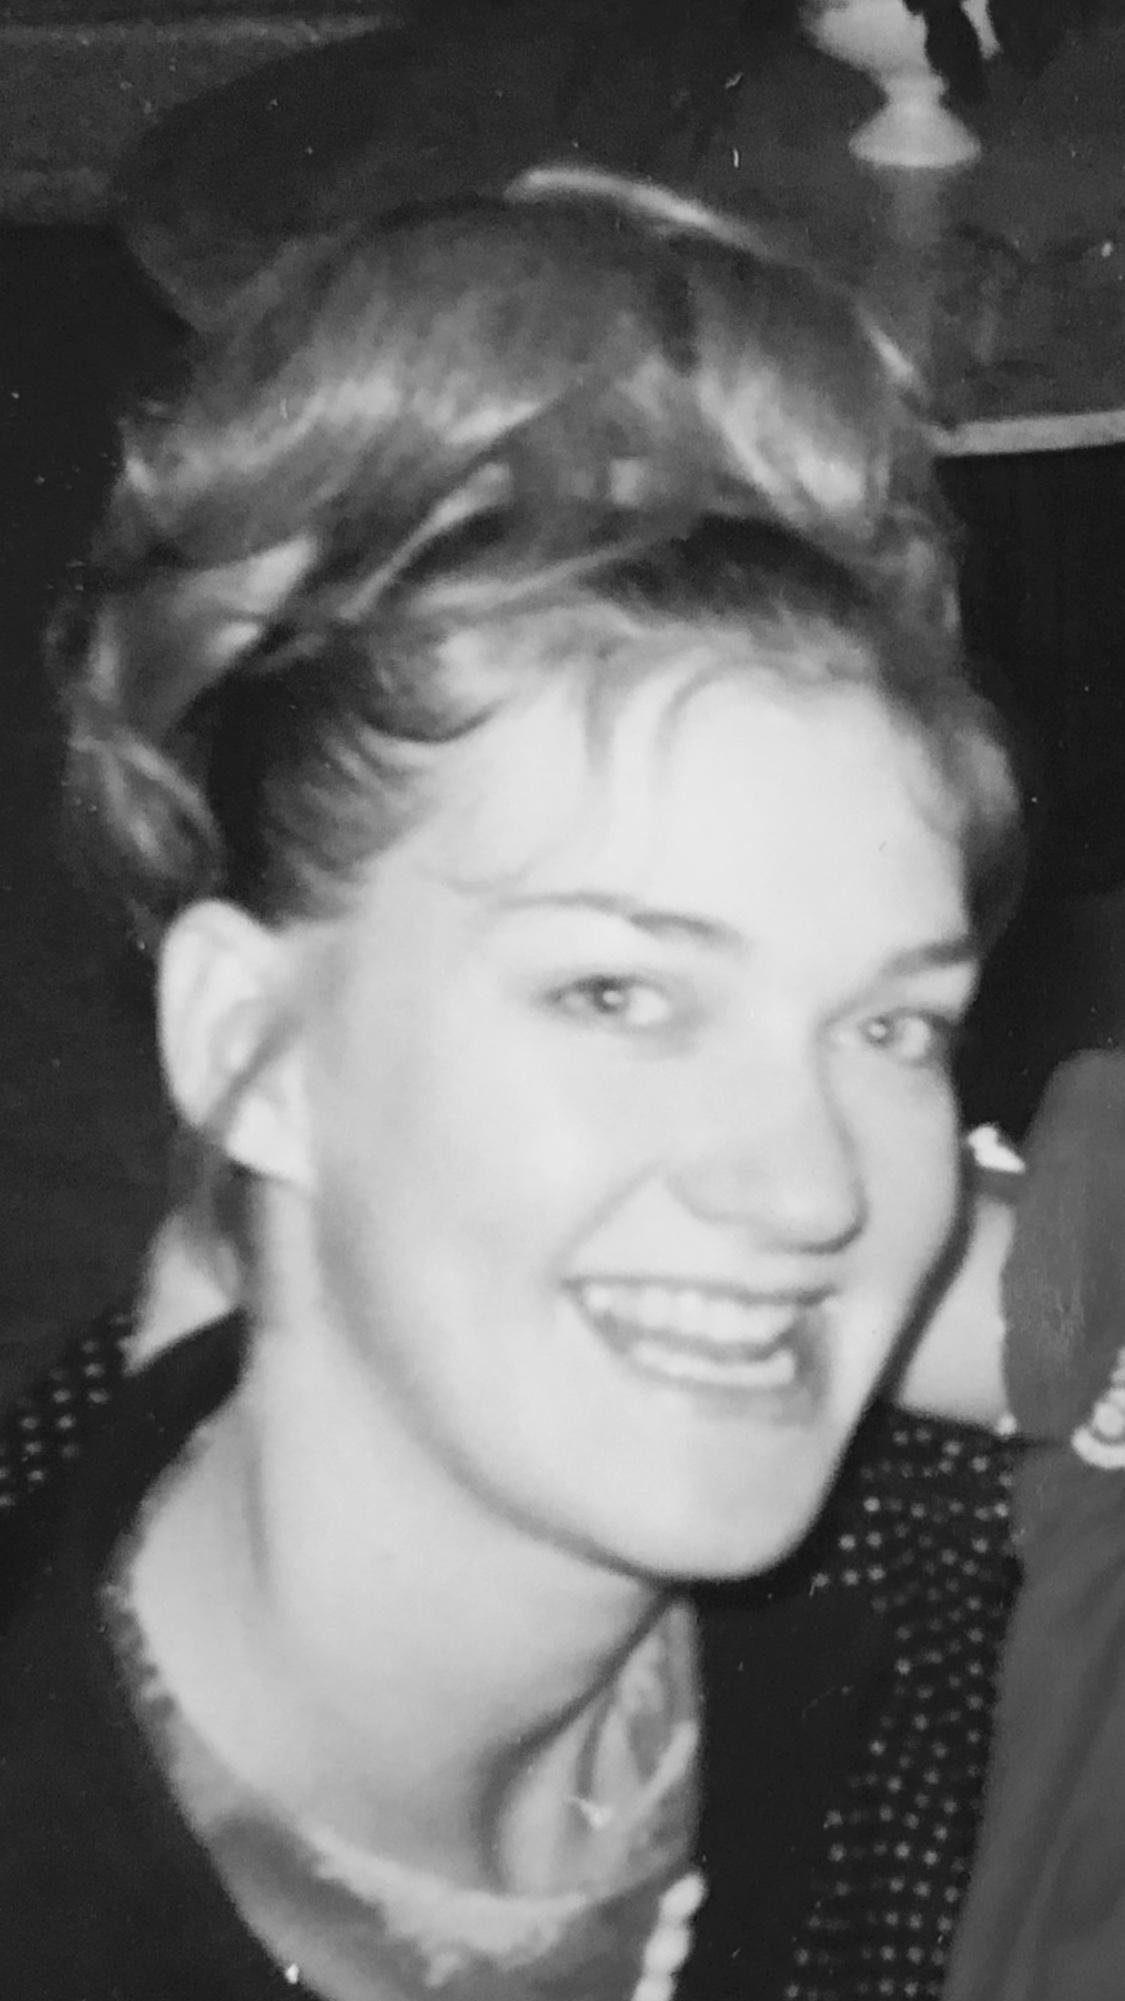 Tessie O'Shea picture